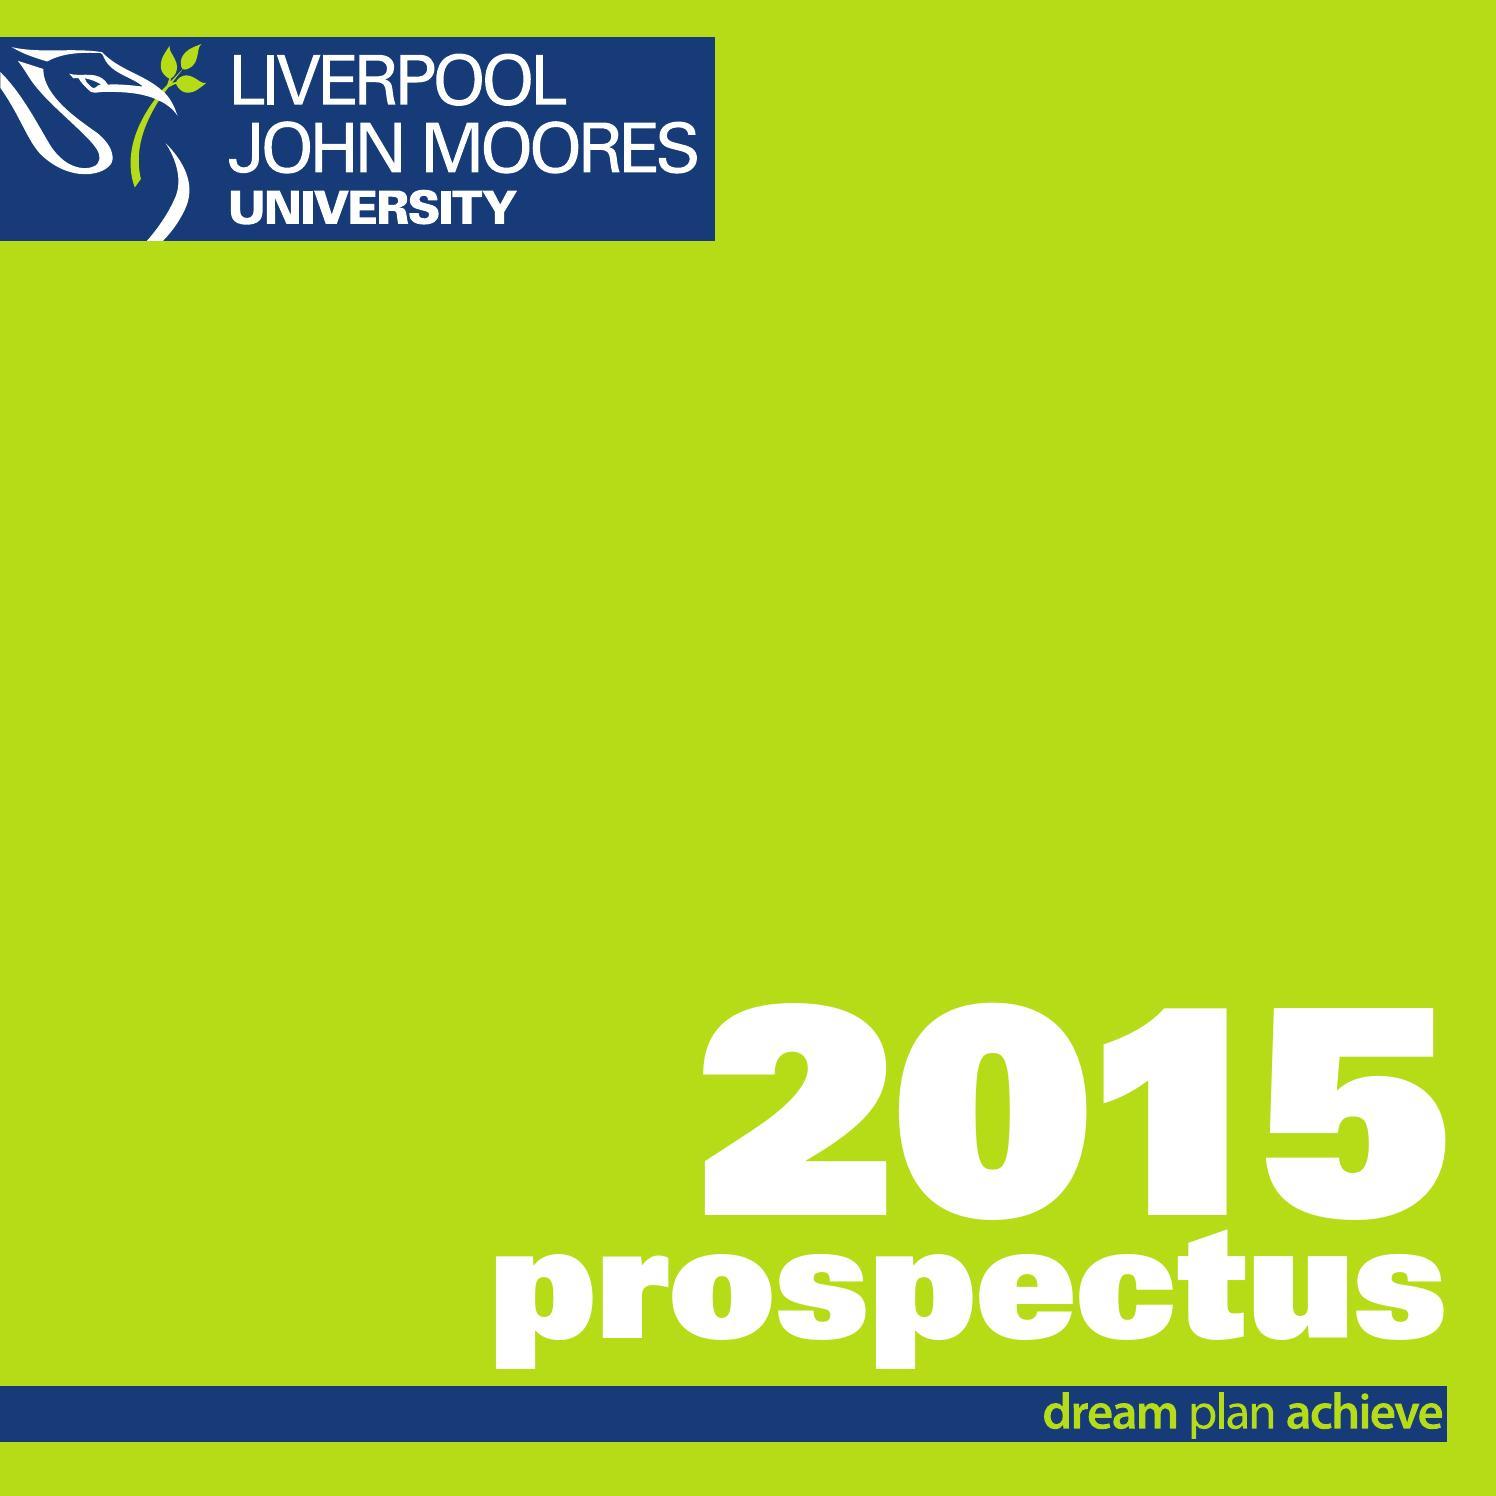 Undergraduate prospectus 2015 entry by Liverpool John Moores University issuu